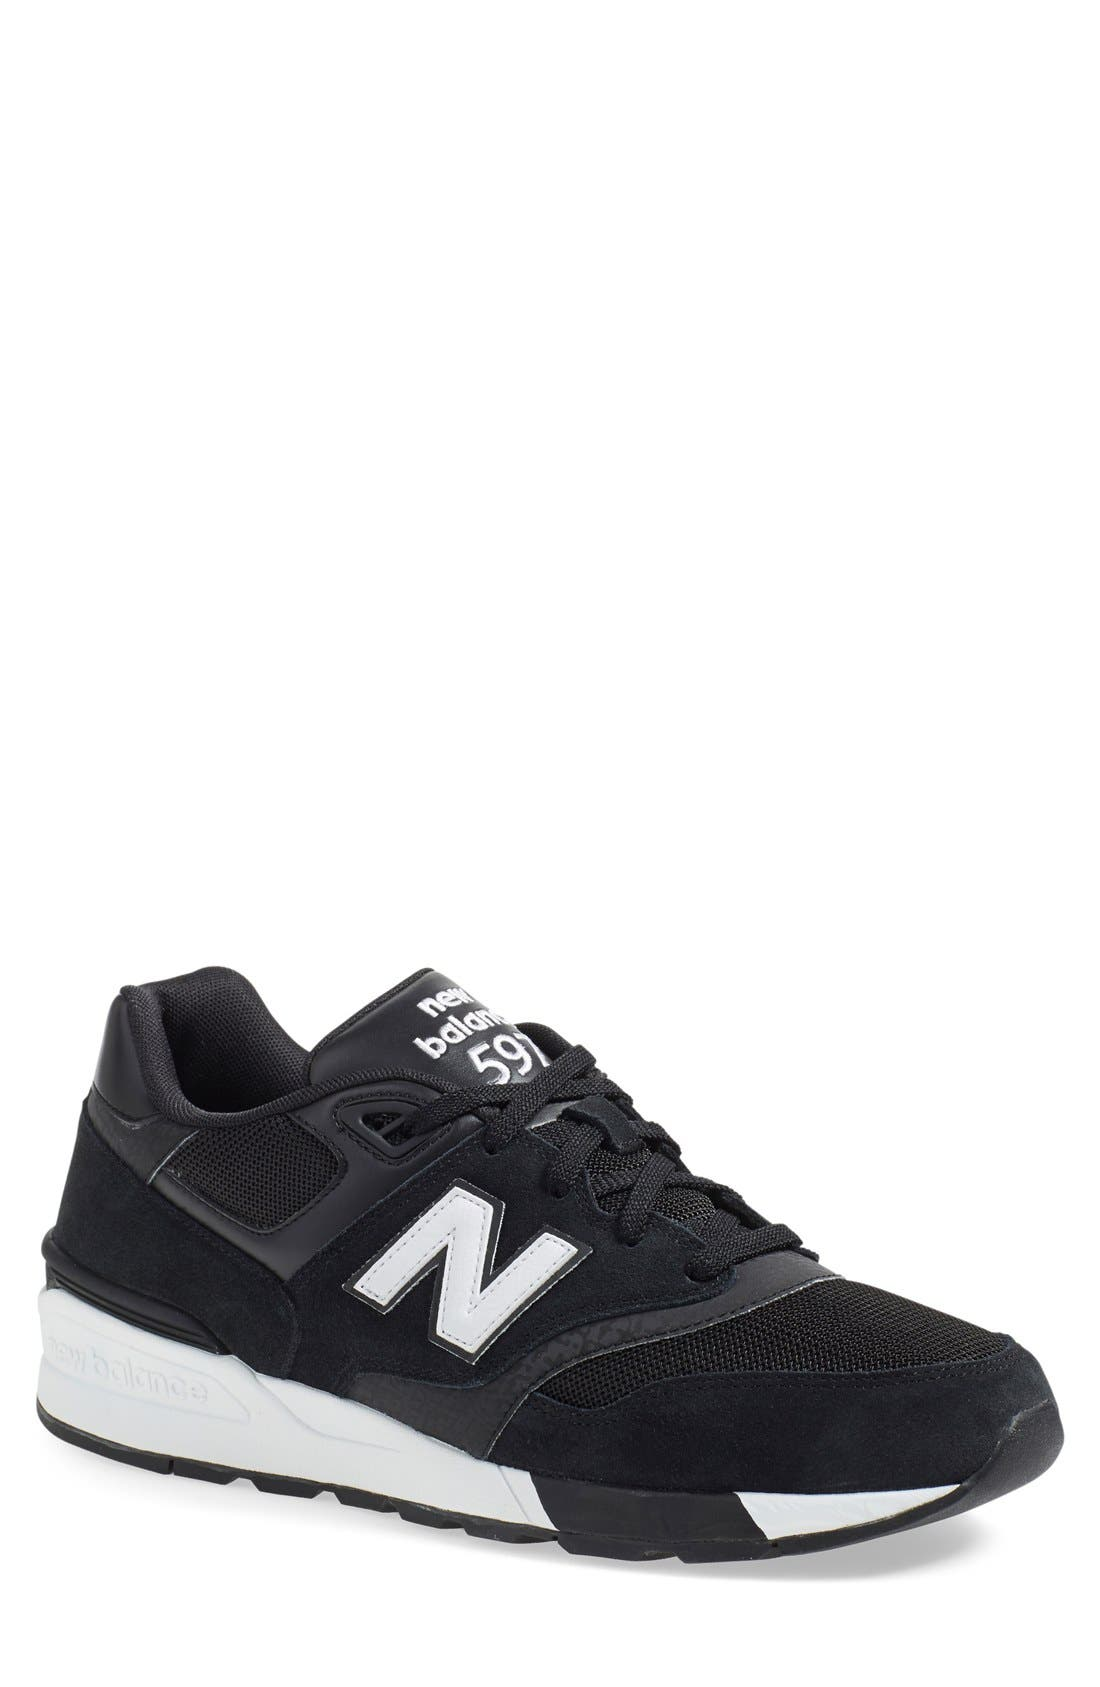 '597' Sneaker,                             Main thumbnail 1, color,                             001